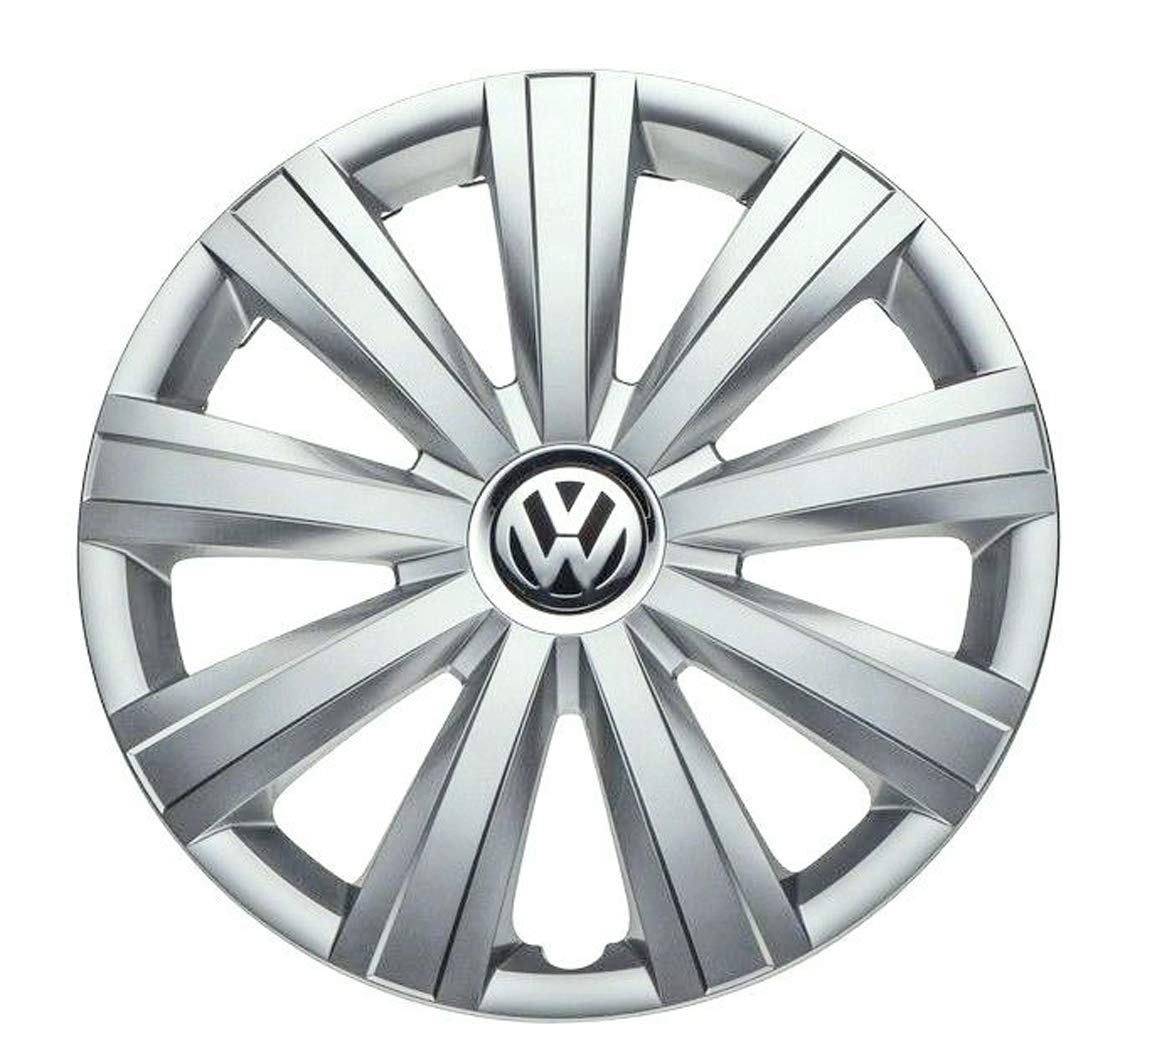 Genuine OEM VW Hub Cap Jetta-Sedan 2011-2014 9-Spoke Cover Fits 15-Inch Wheel